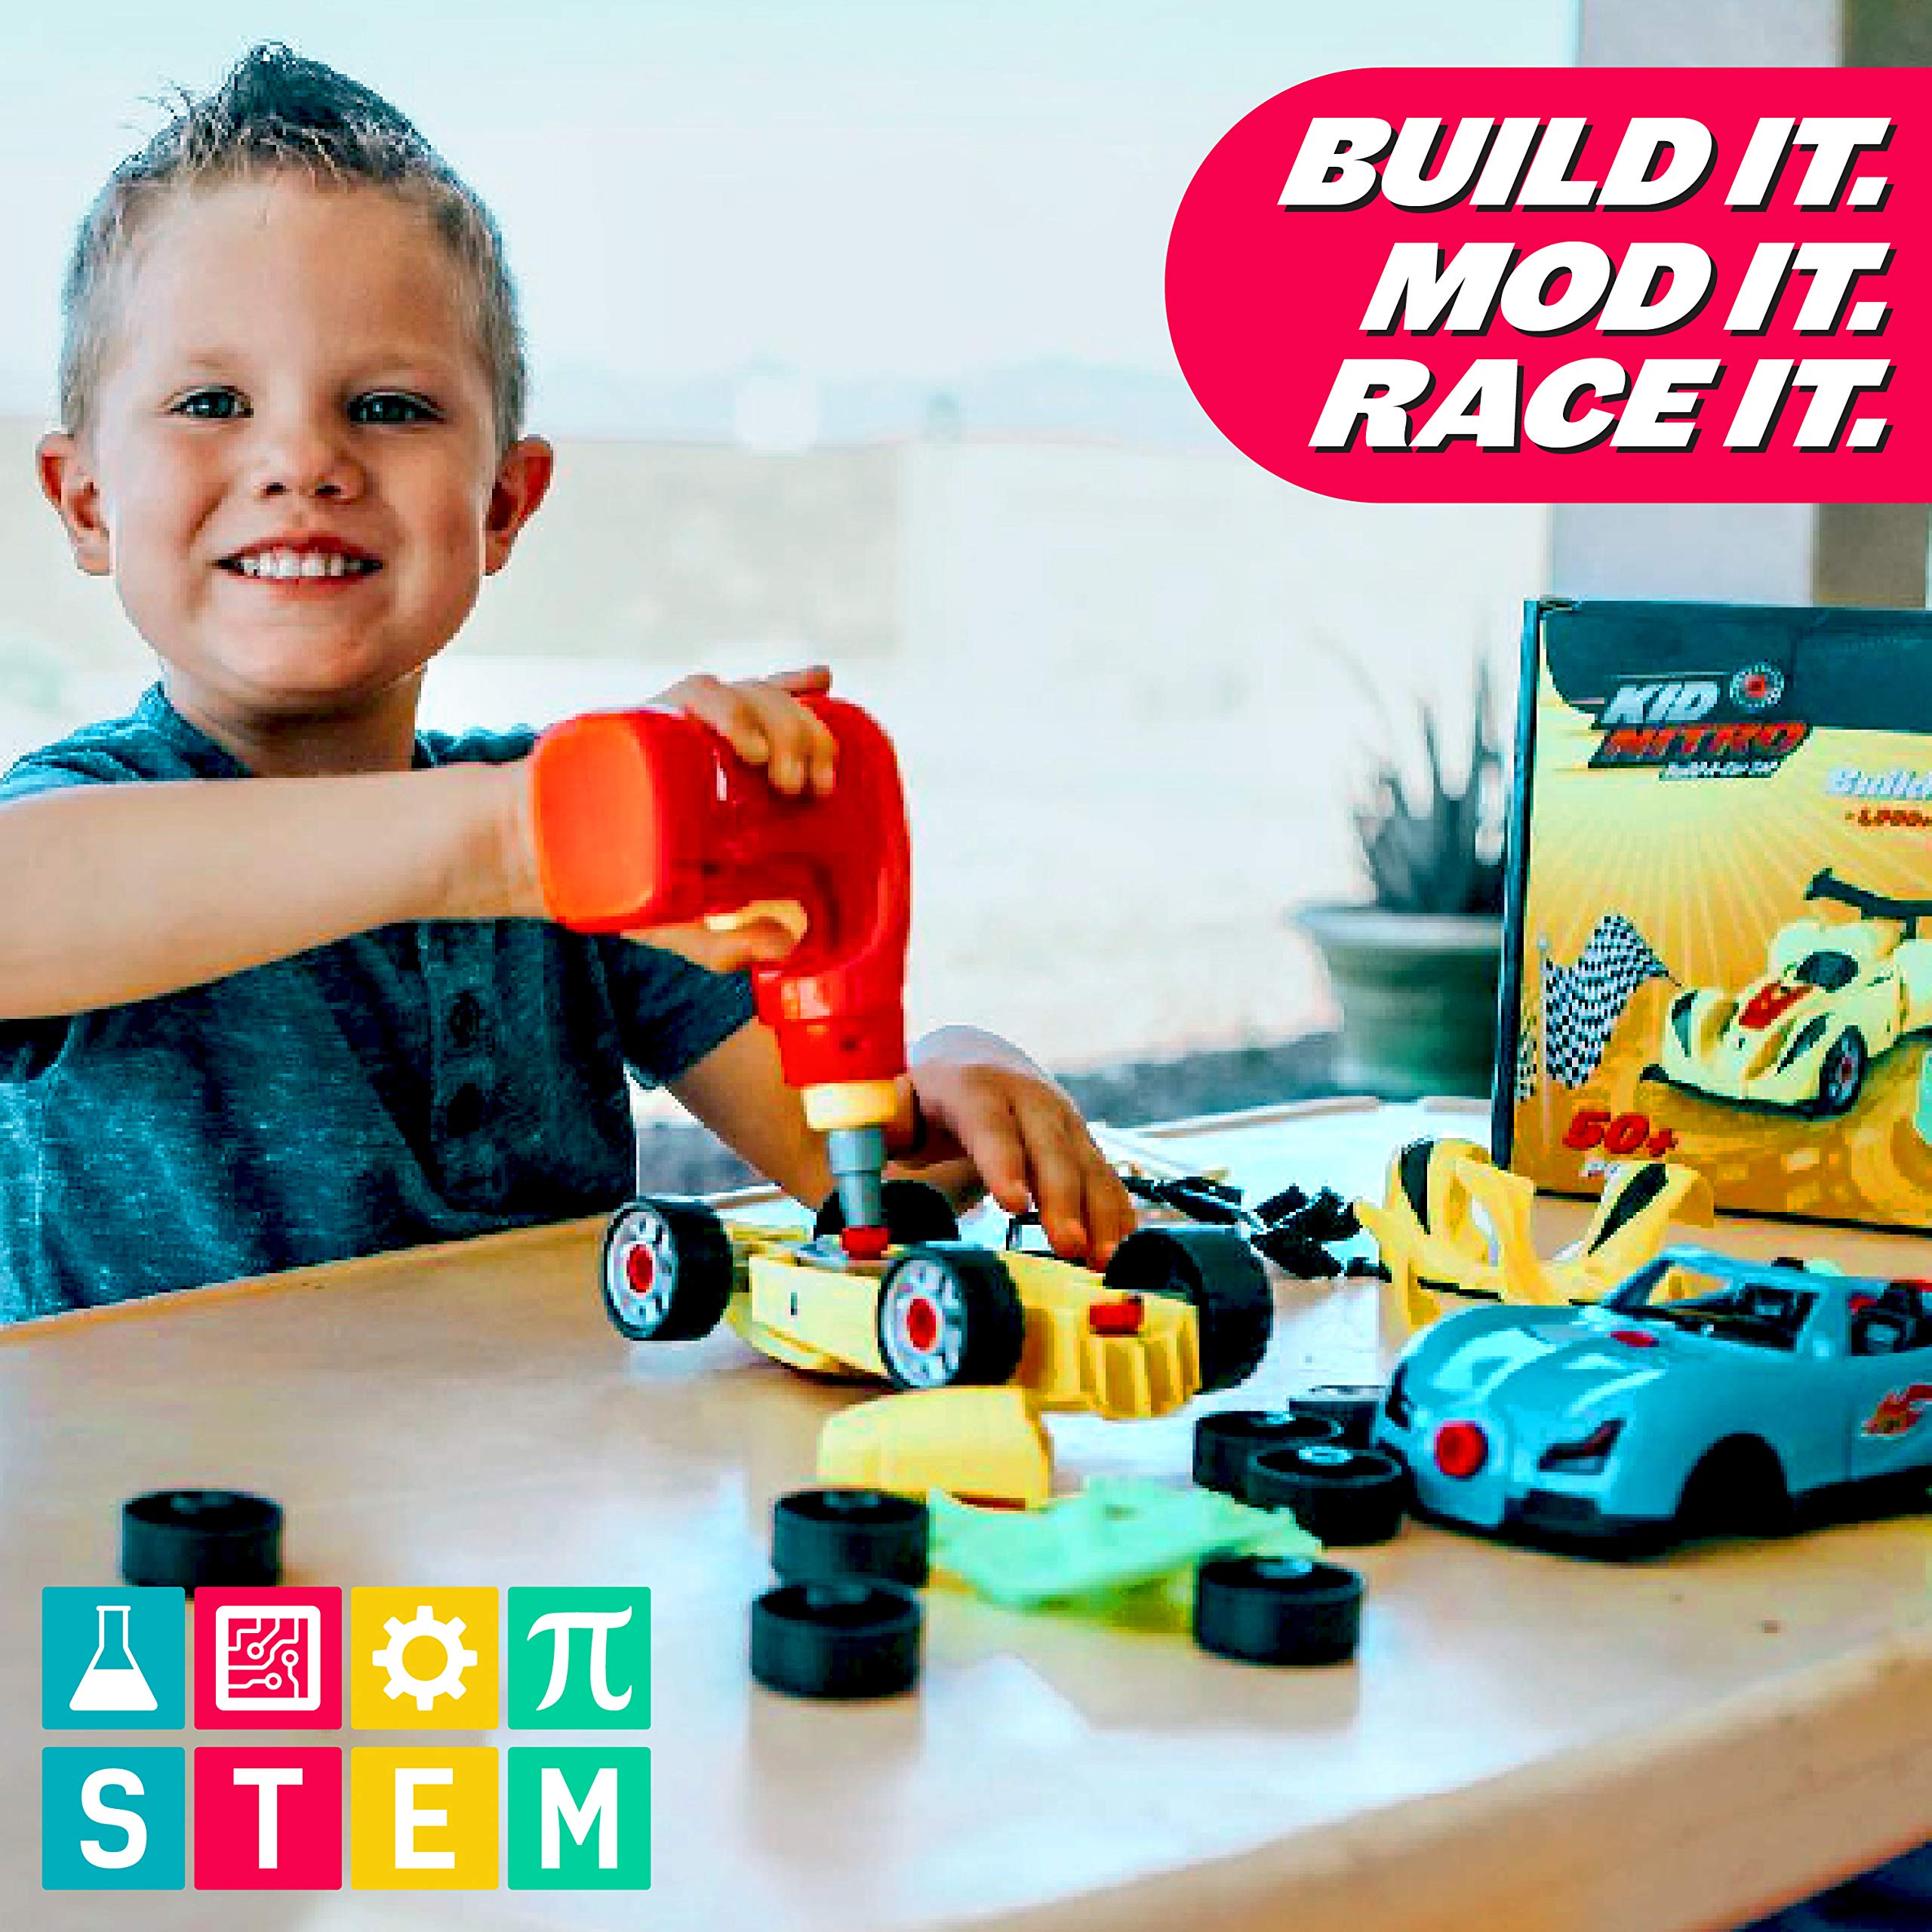 USA Toyz Race Car Take Apart Toys - 52pk Build a Car STEM Building Toys Set, Take Apart Car Building Kits for Kids w/ Car Drill Tool for Boys or Girls by USA Toyz (Image #6)